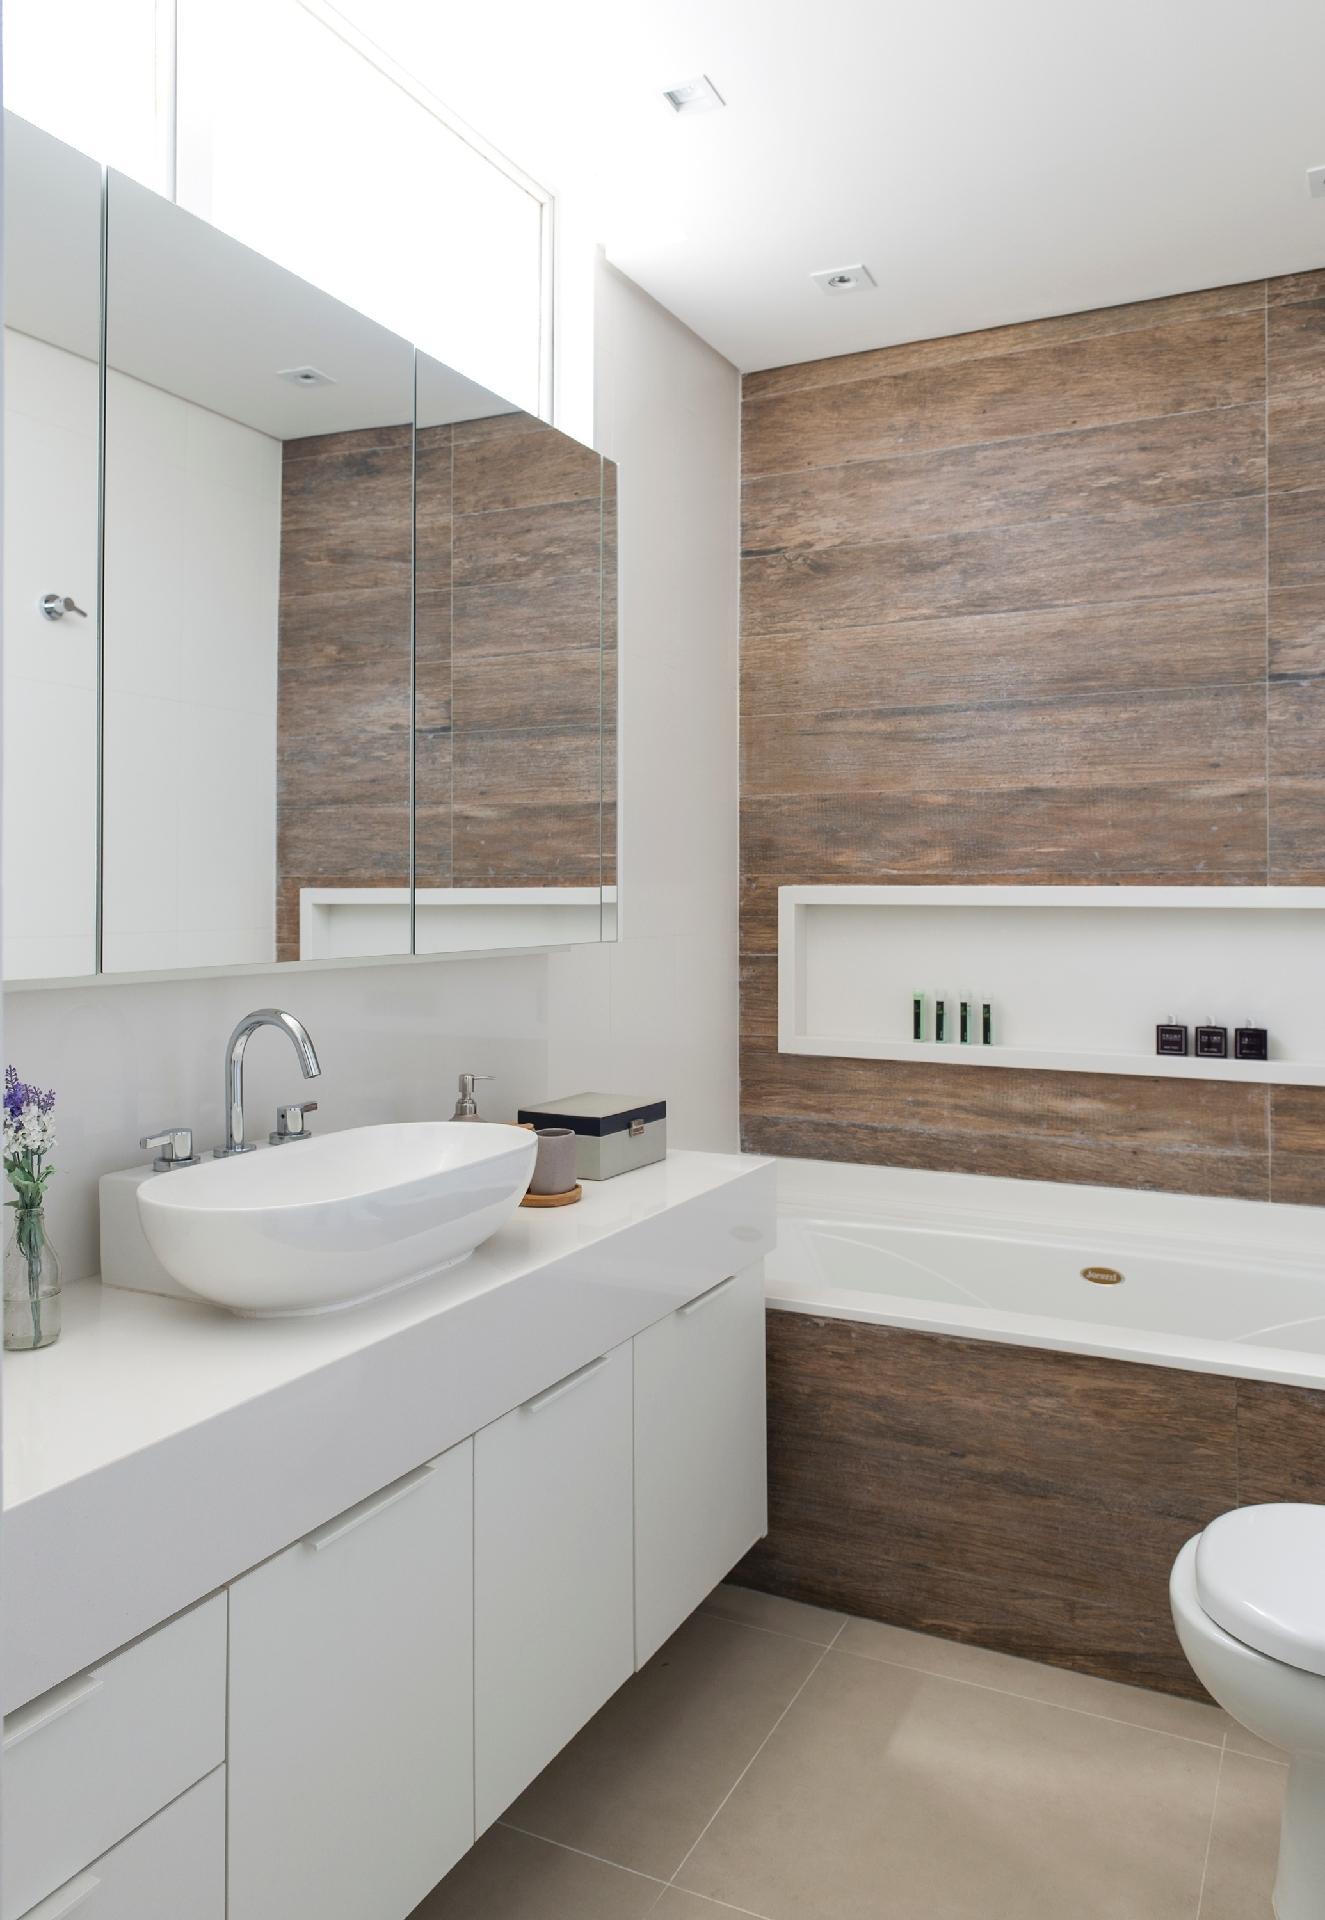 Casa e decora o uol estilo de vida for Compra de lavabos